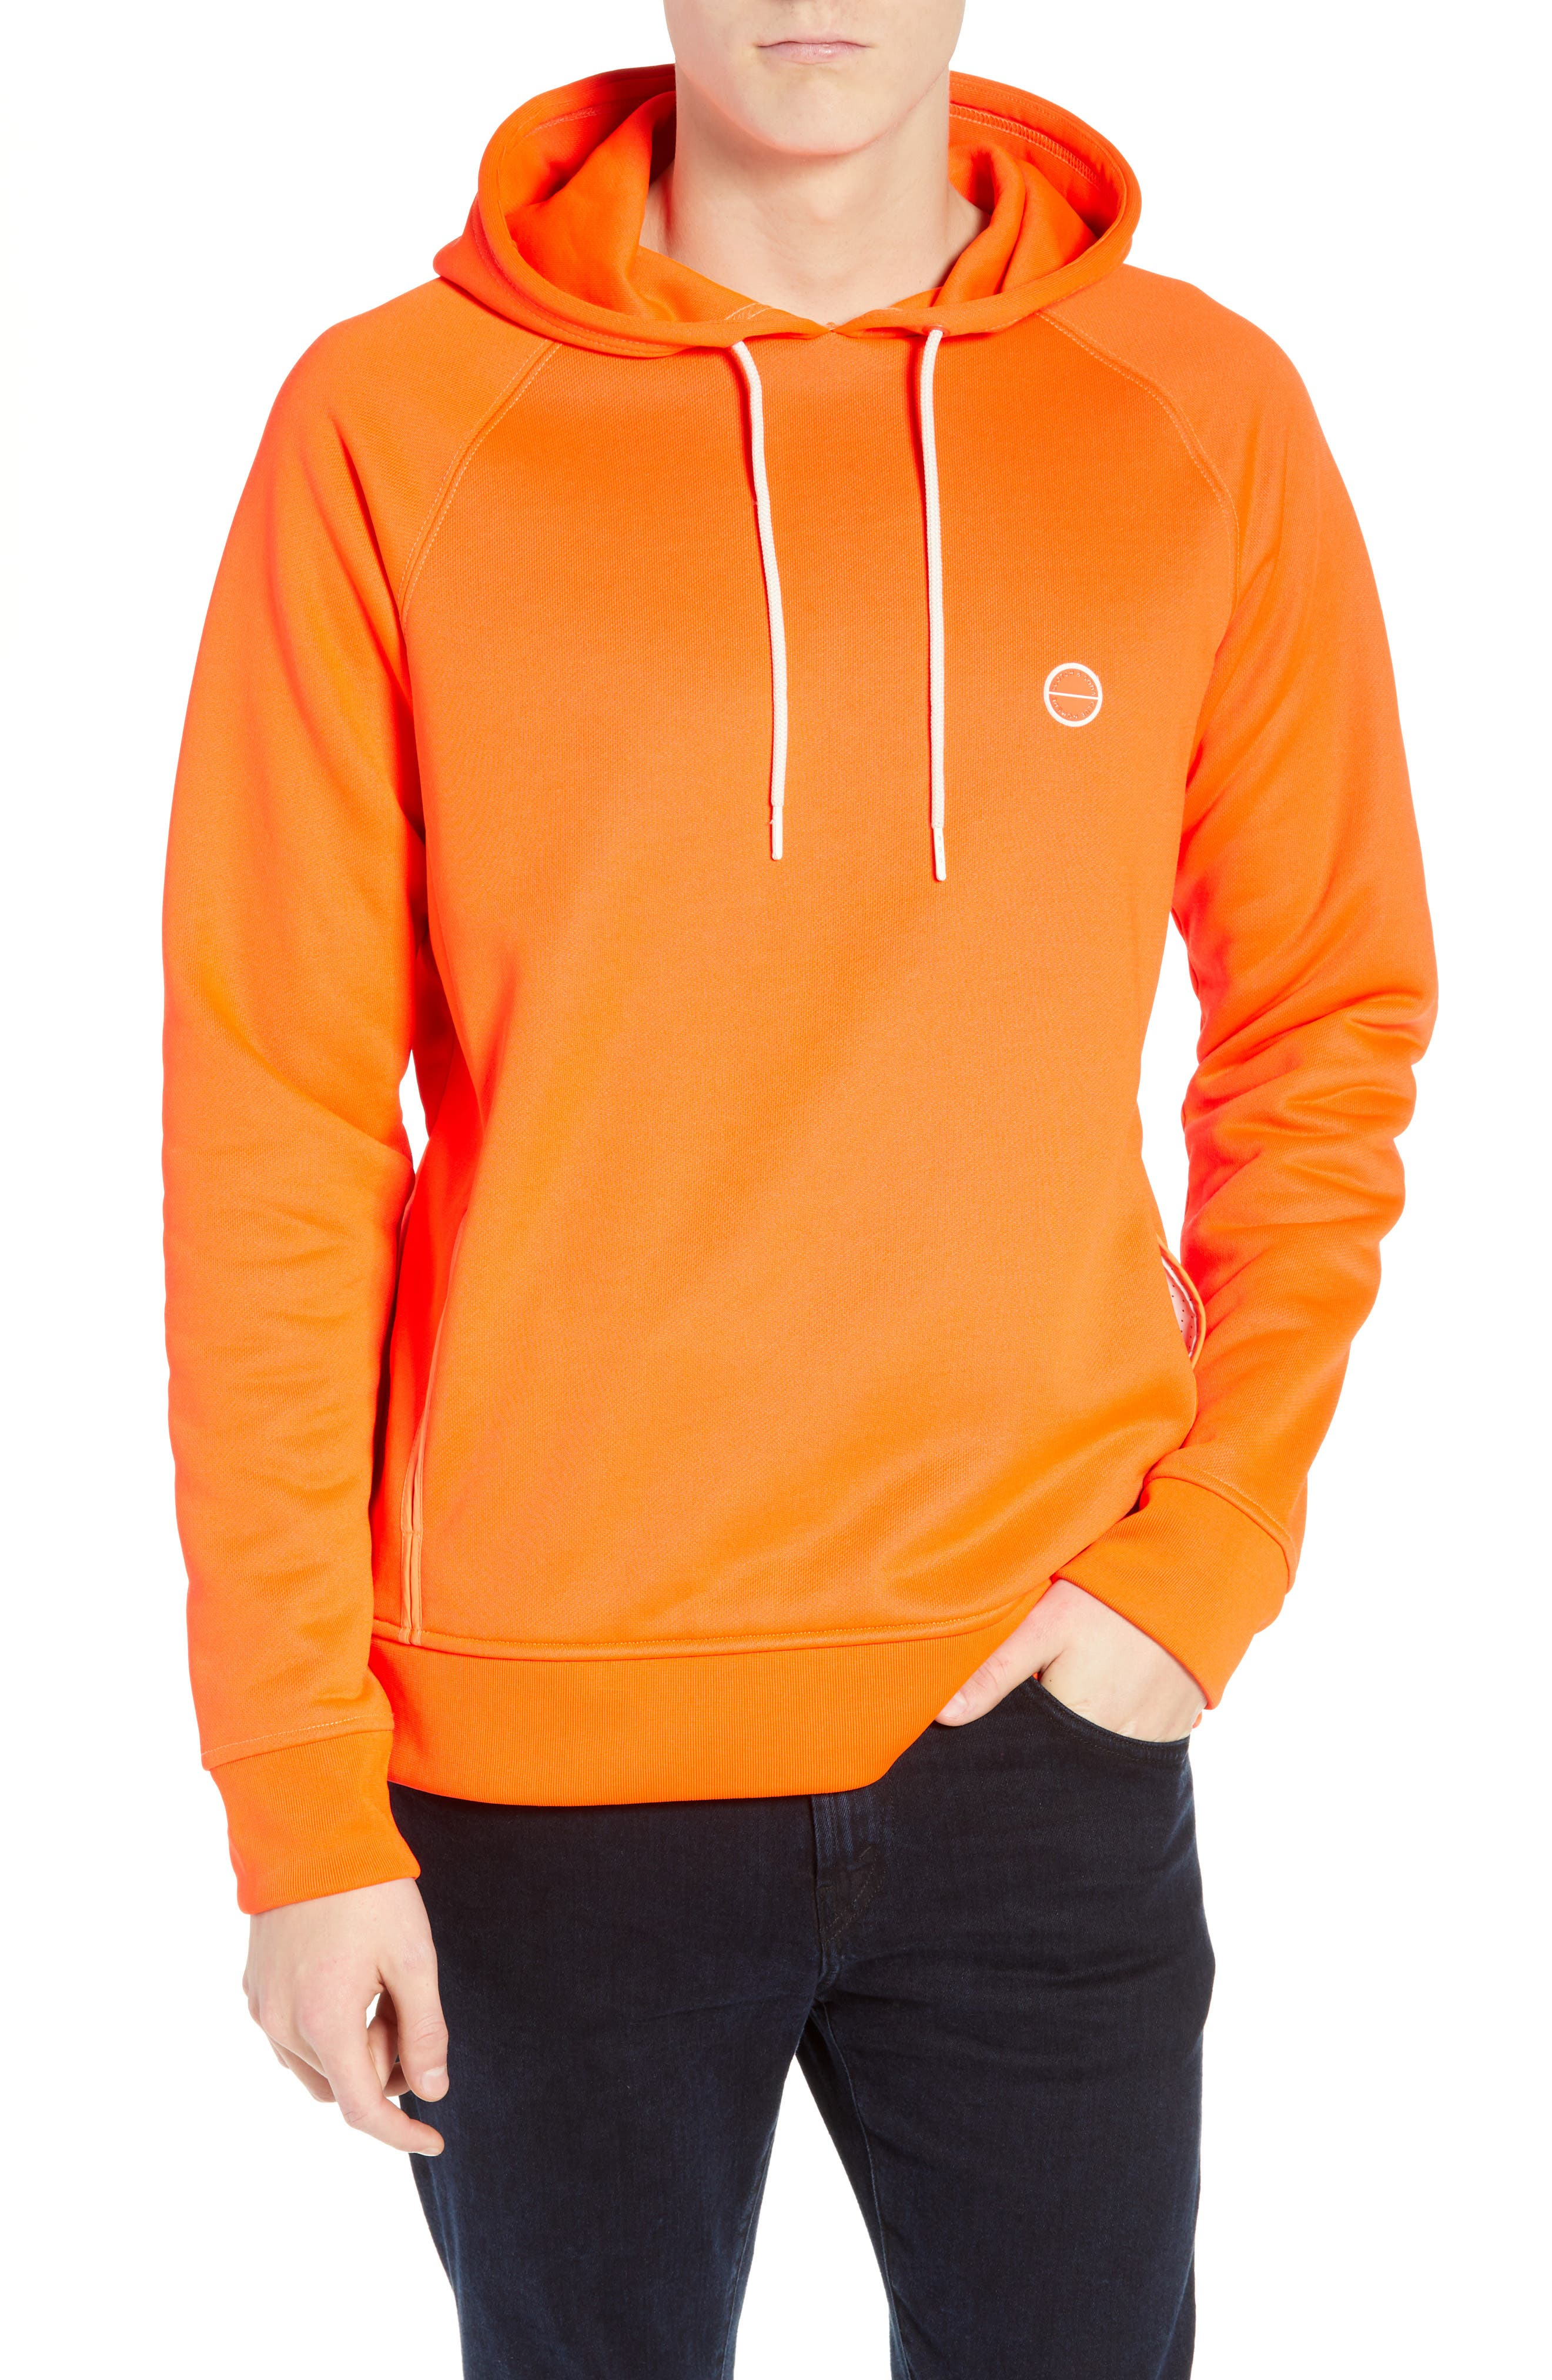 SCOTCH & SODA Club Nomade Hooded Sweatshirt in Fluo Orange